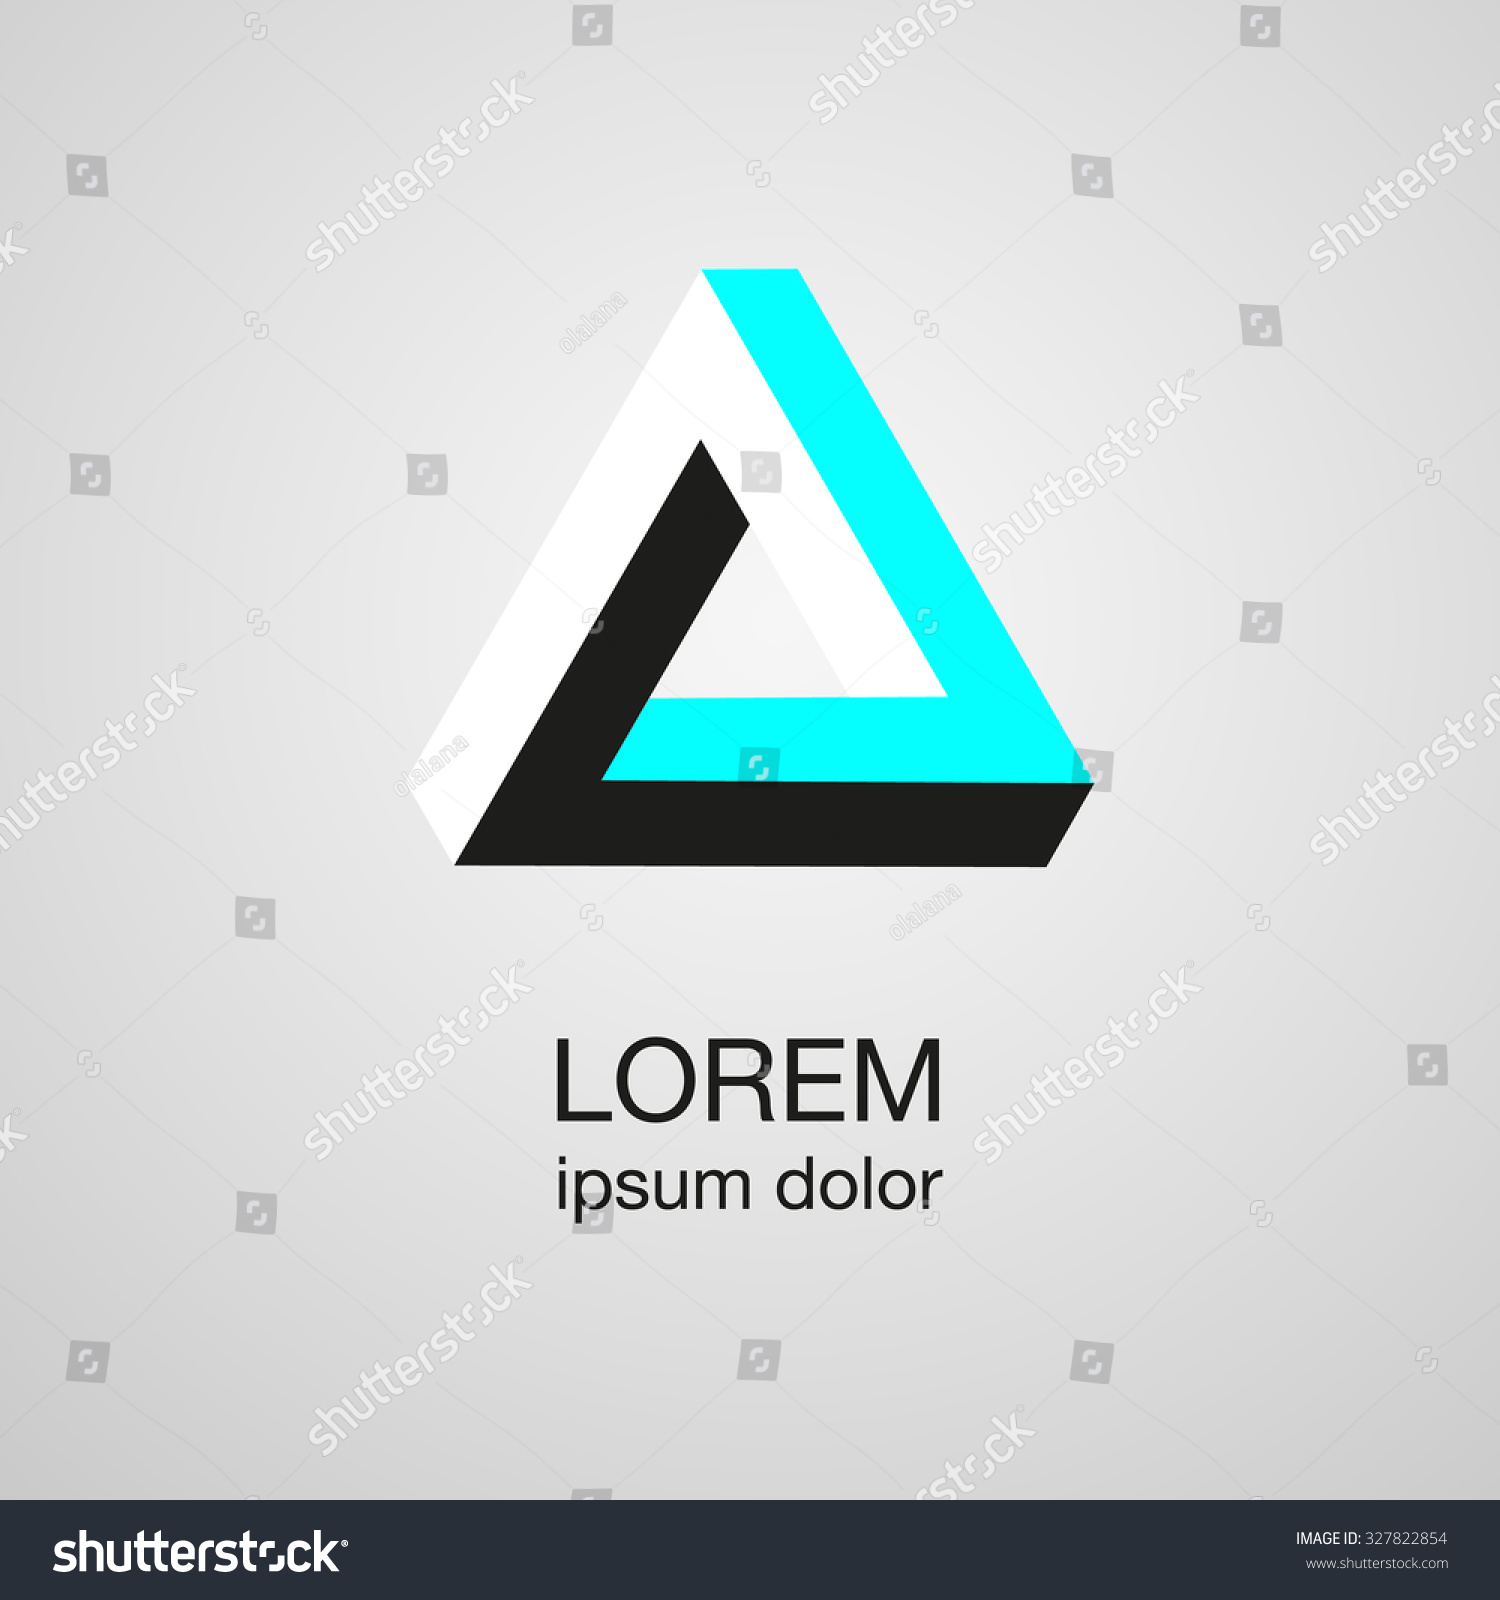 Optical Illusion Logo Template, Vector - 327822854 ...  Optical Illusion Logo